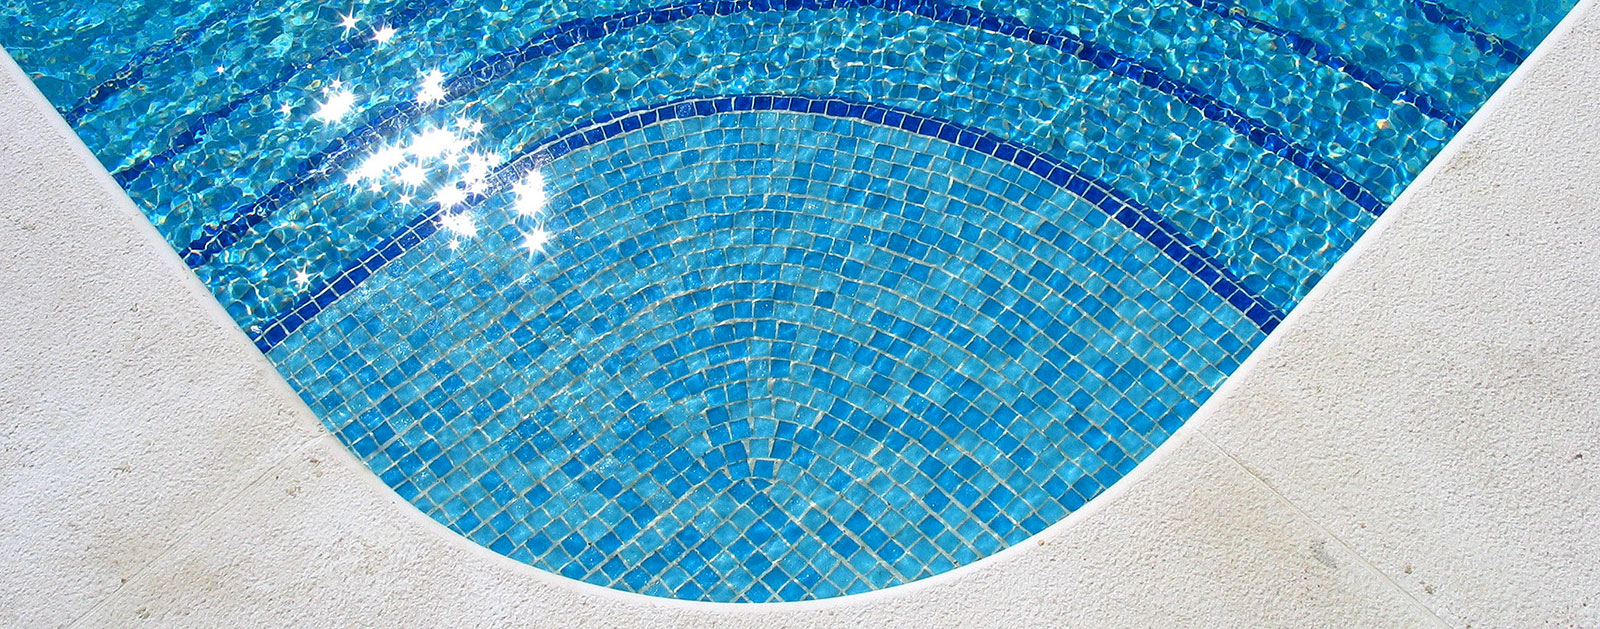 Hydra water concessionaria culligan piscine piacenza for Piscina hydra villabate prezzi